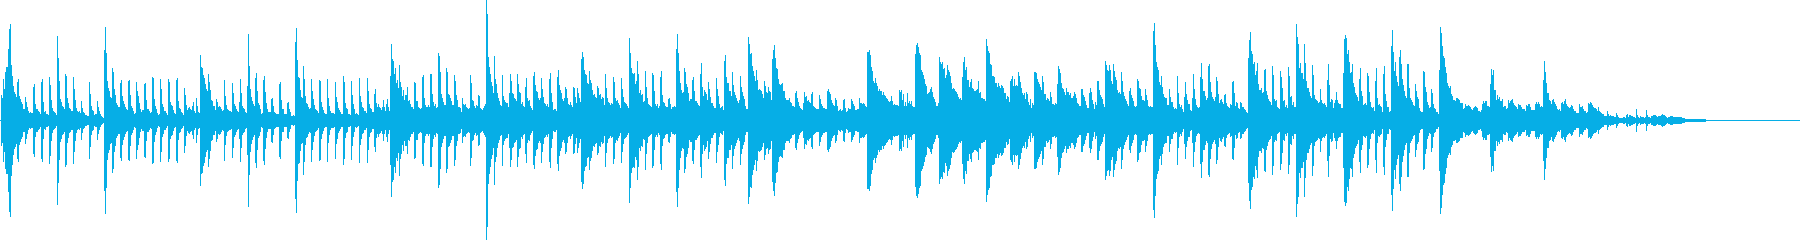 KANTピアノソロ4幻想的なシーン等用の再生済みの波形